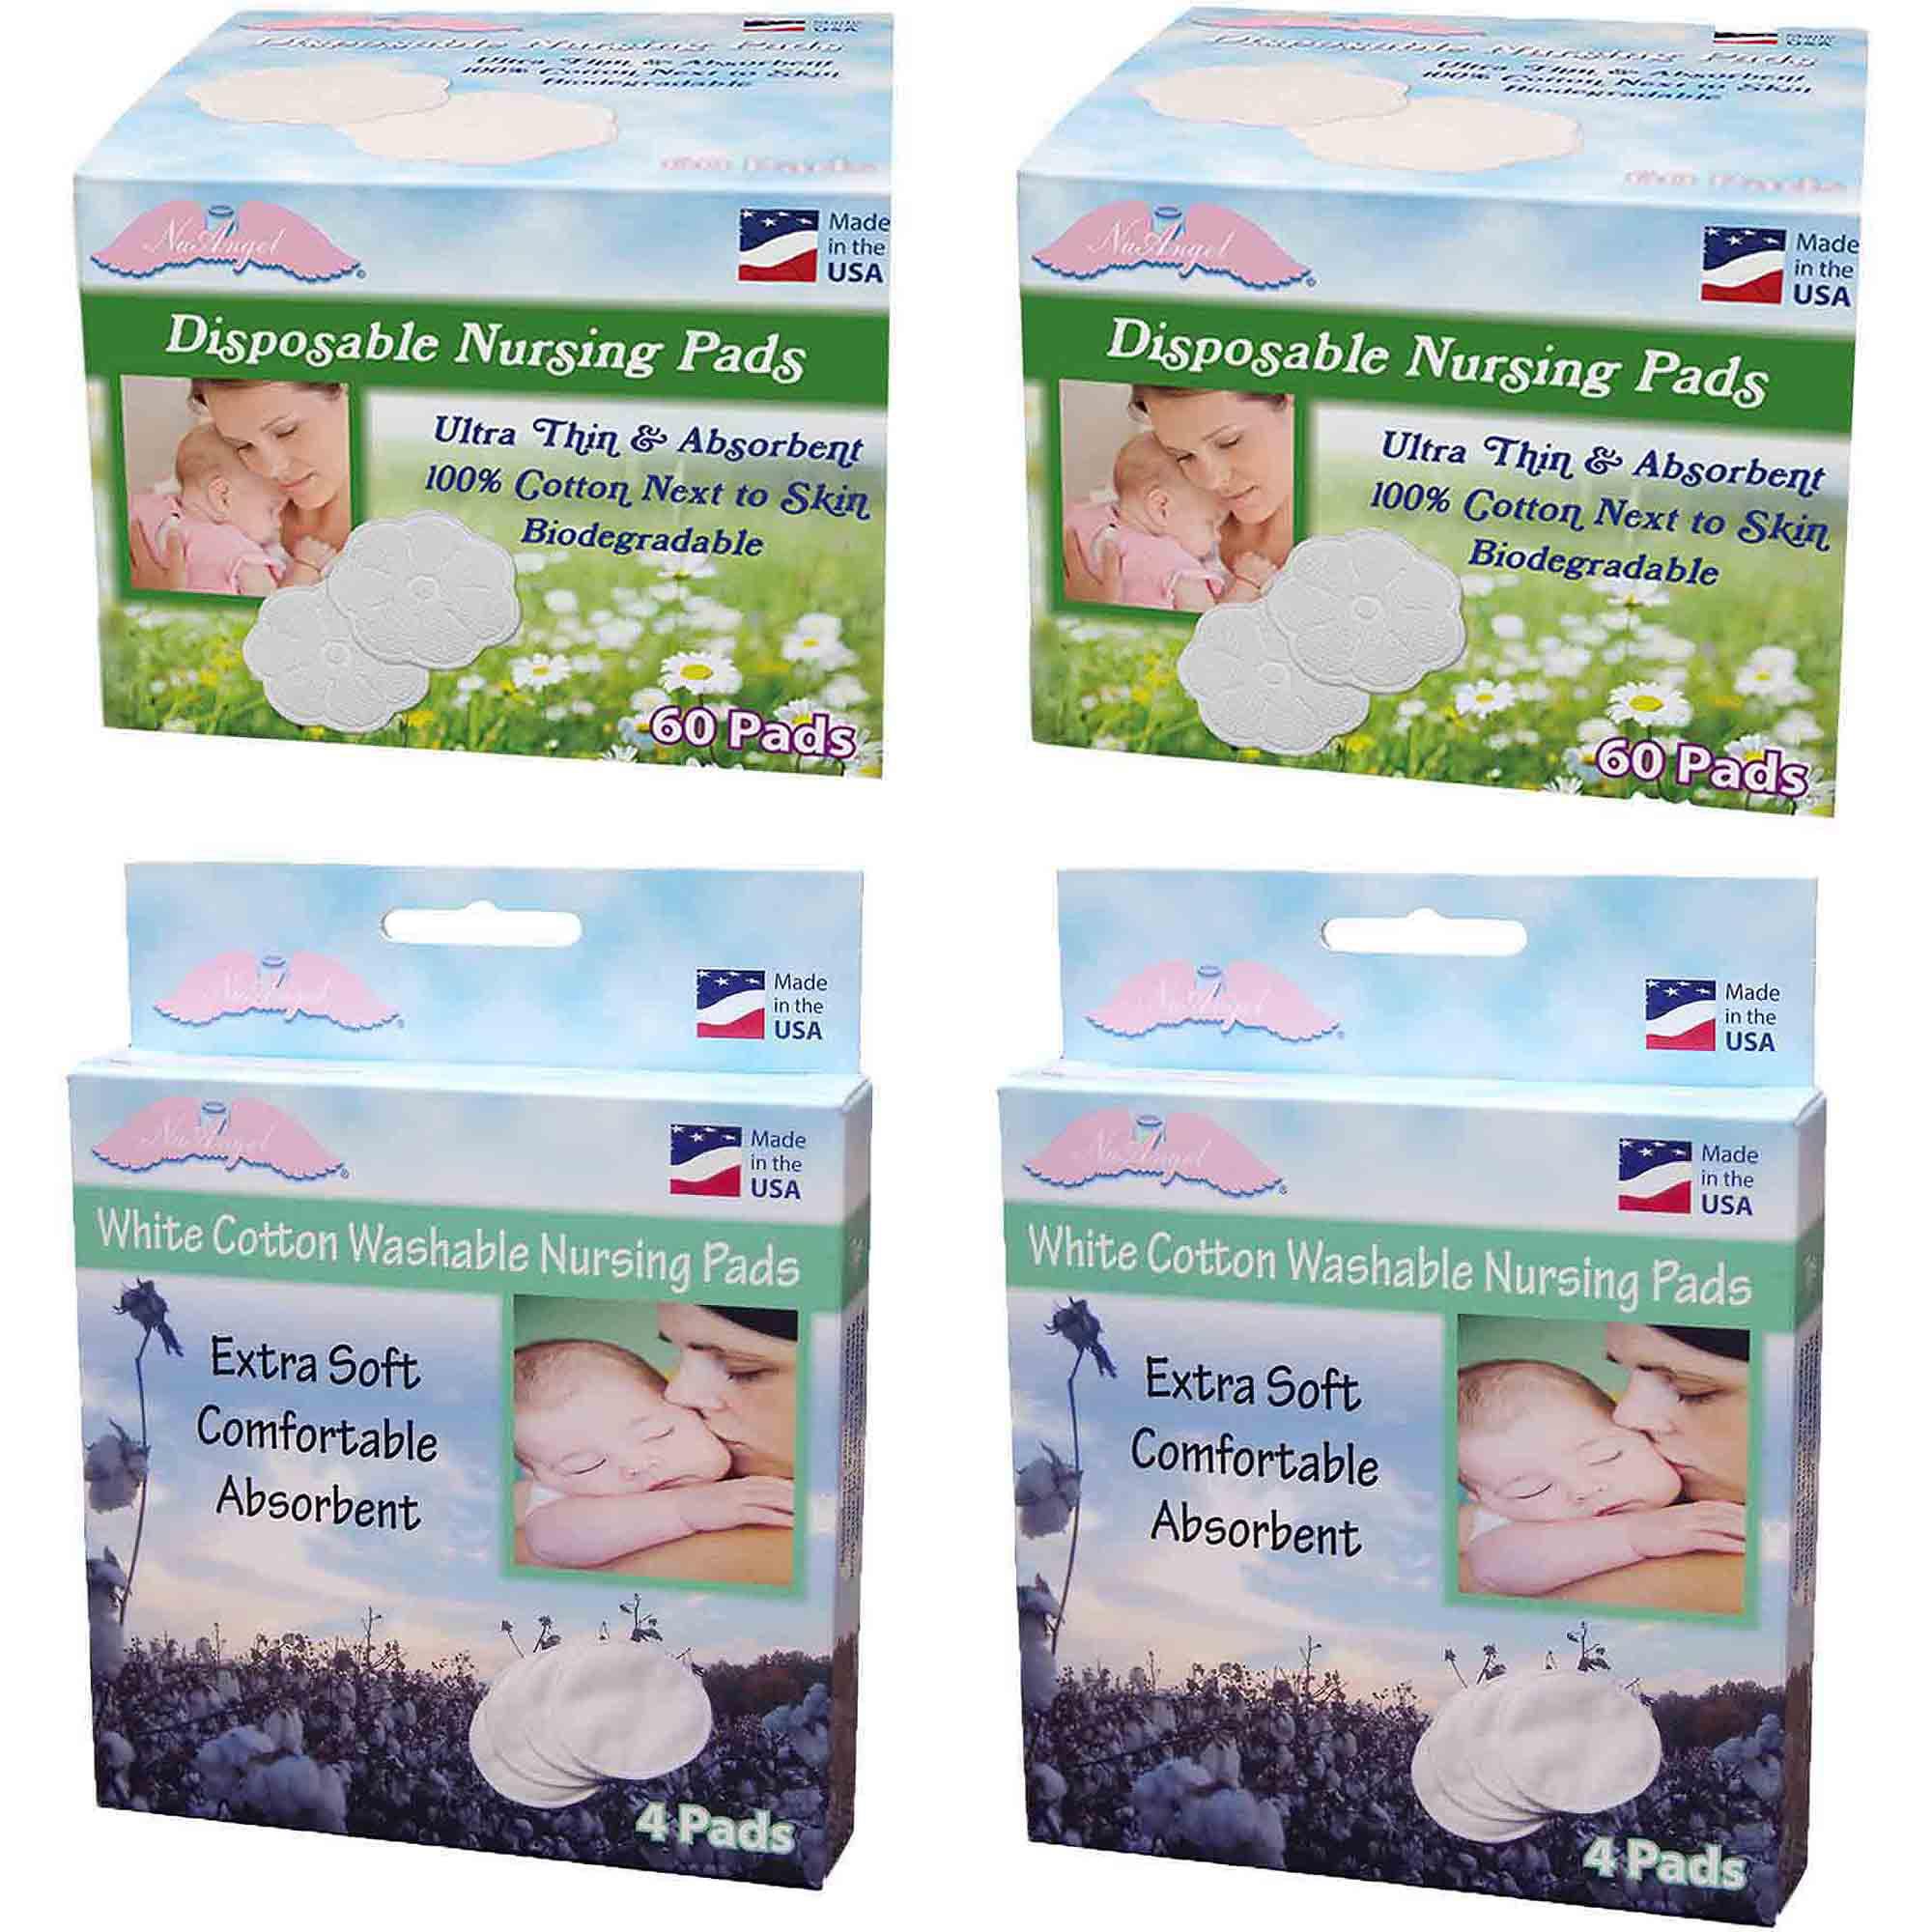 NuAngel All-Natural Washable Cotton & Biodegradable Disposable Cotton Nursing Pad Set, White by NuAngel